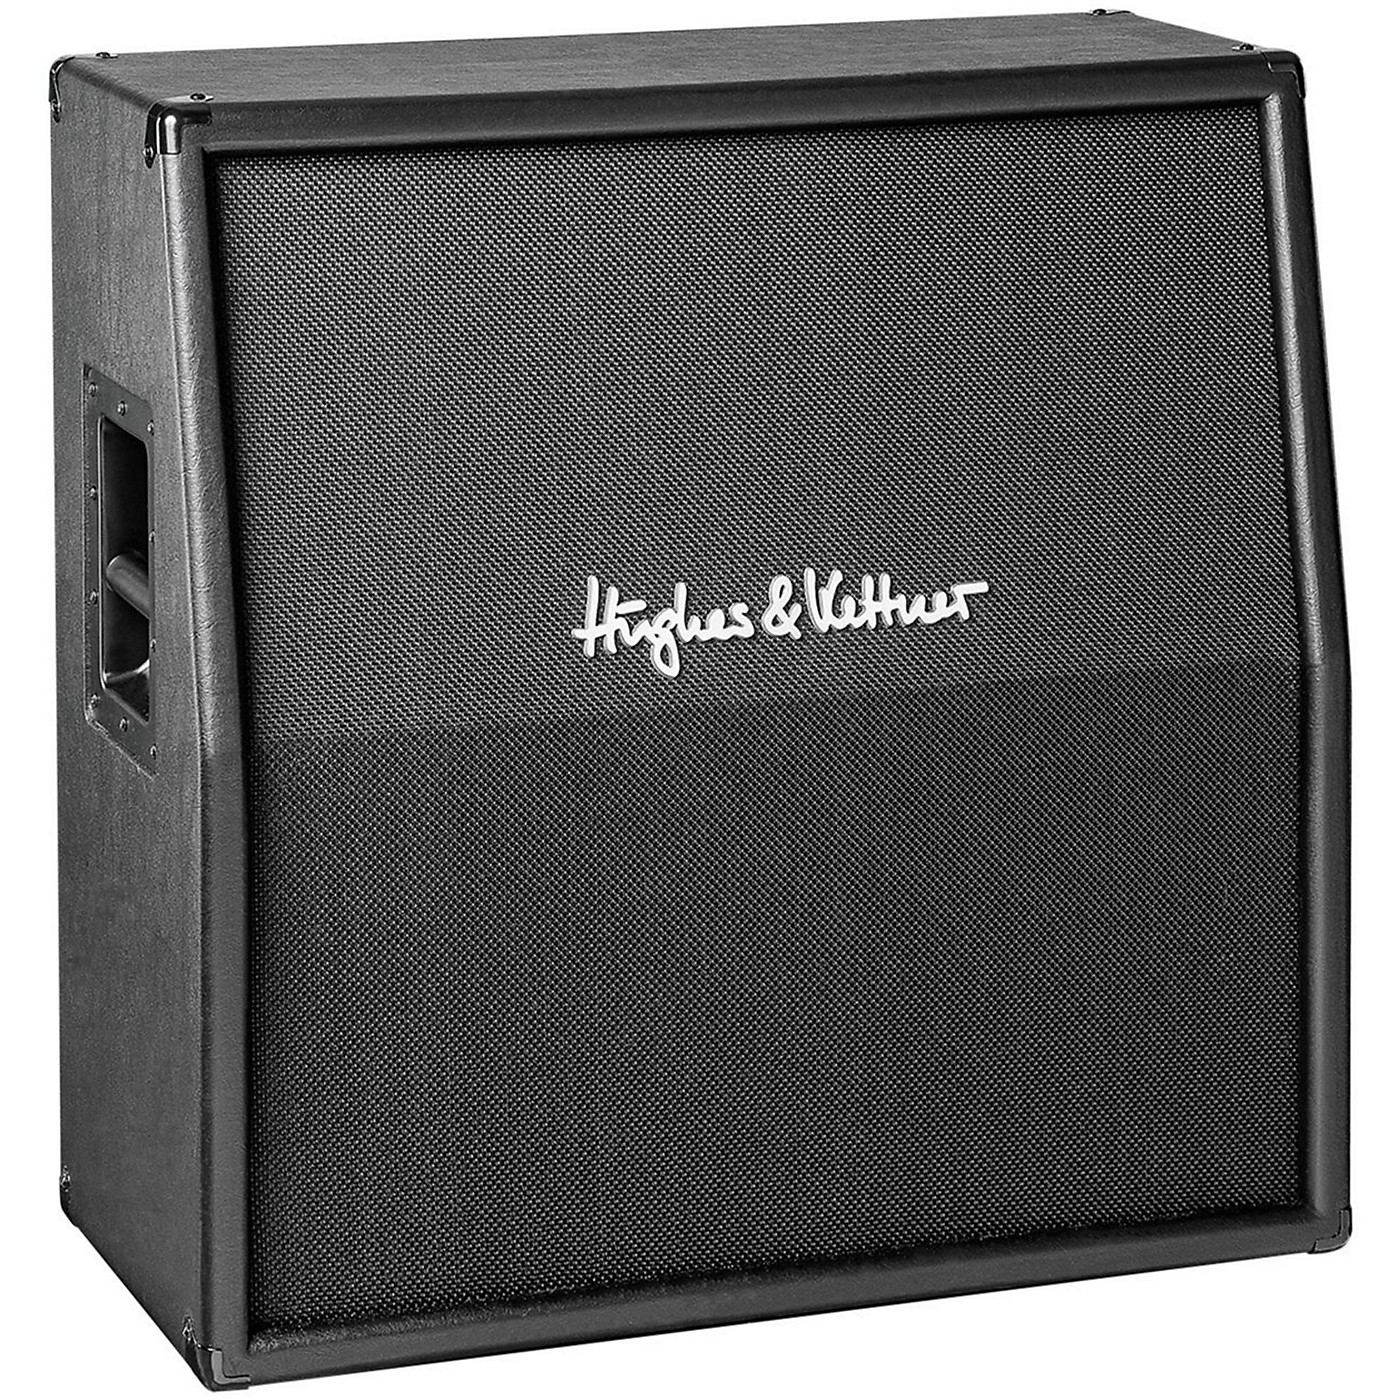 Hughes & Kettner Triamp Mark III 4x12 Guitar Speaker Cabinet thumbnail